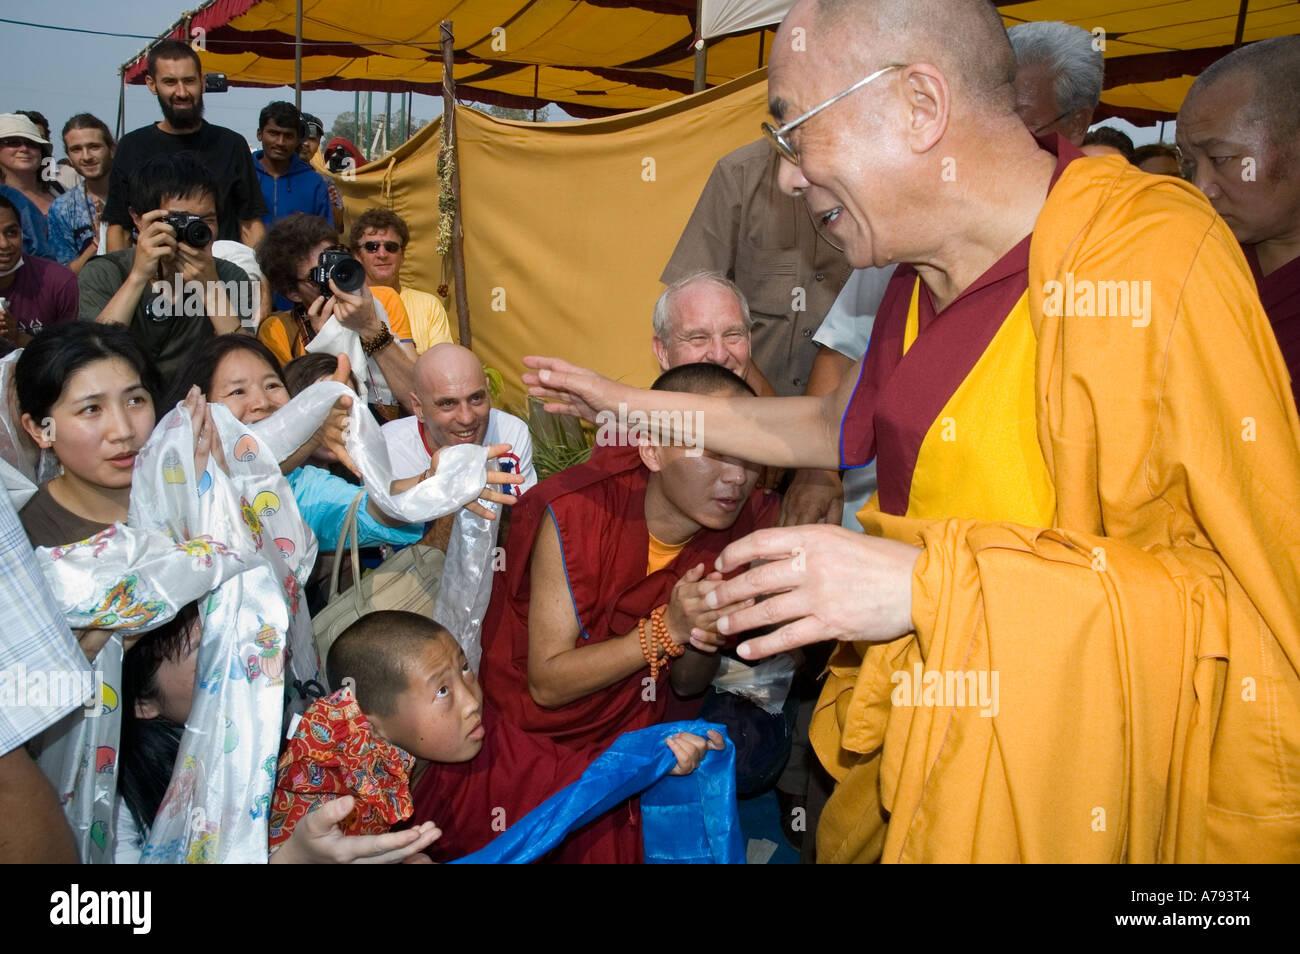 Dalai Lama meets westerners Kalachakra ceremony Amaravati India - Stock Image